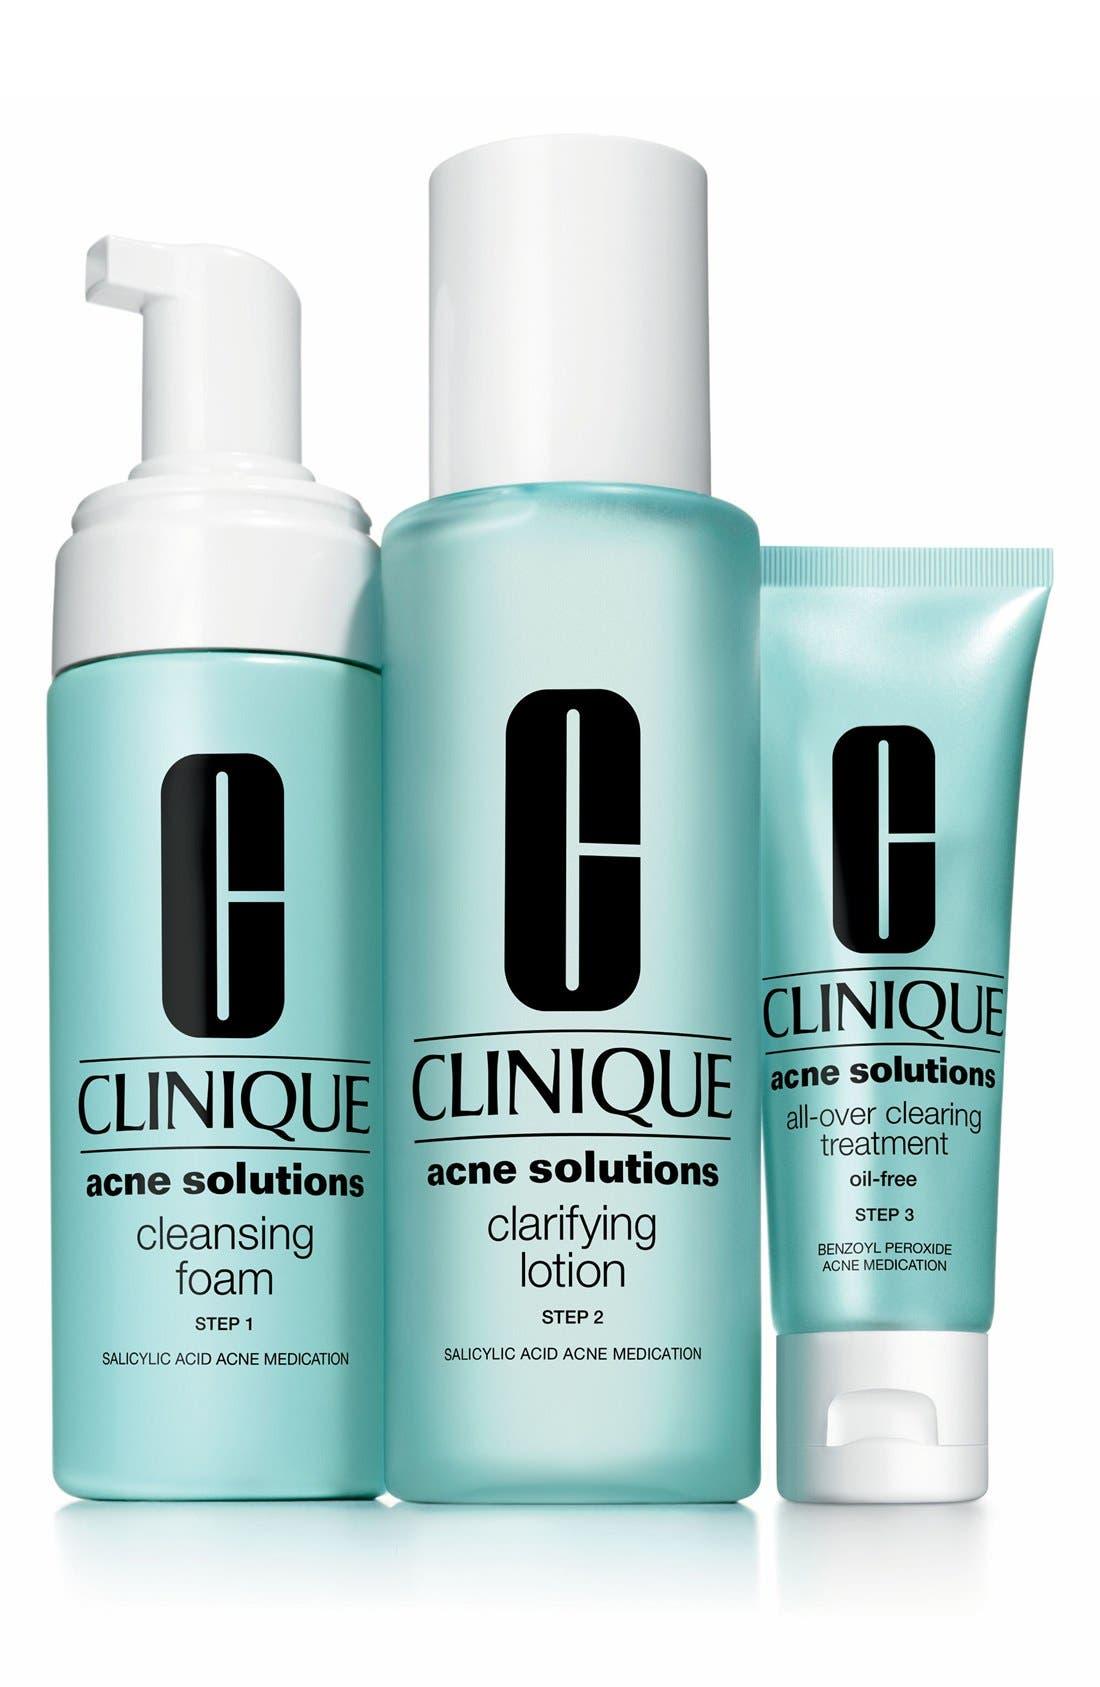 Clinique Acne-Prone Regimen